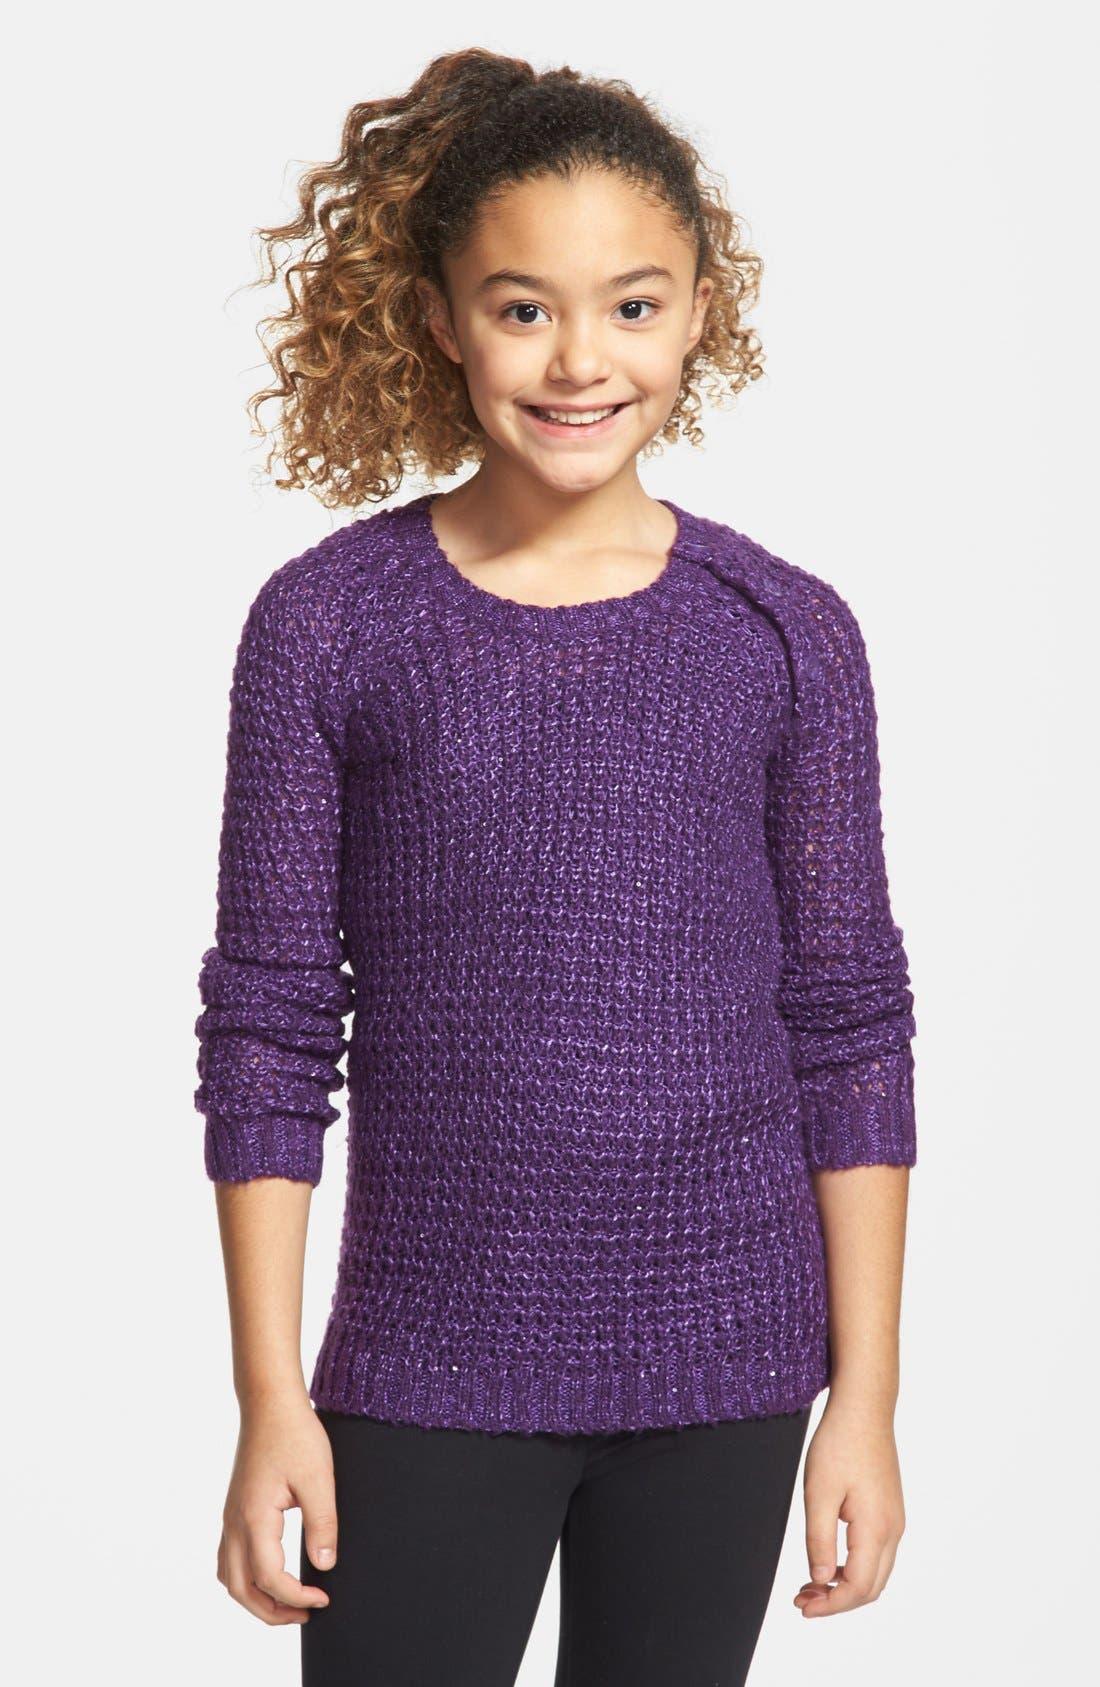 Alternate Image 1 Selected - Tucker + Tate 'Gia' Sweater (Big Girls)